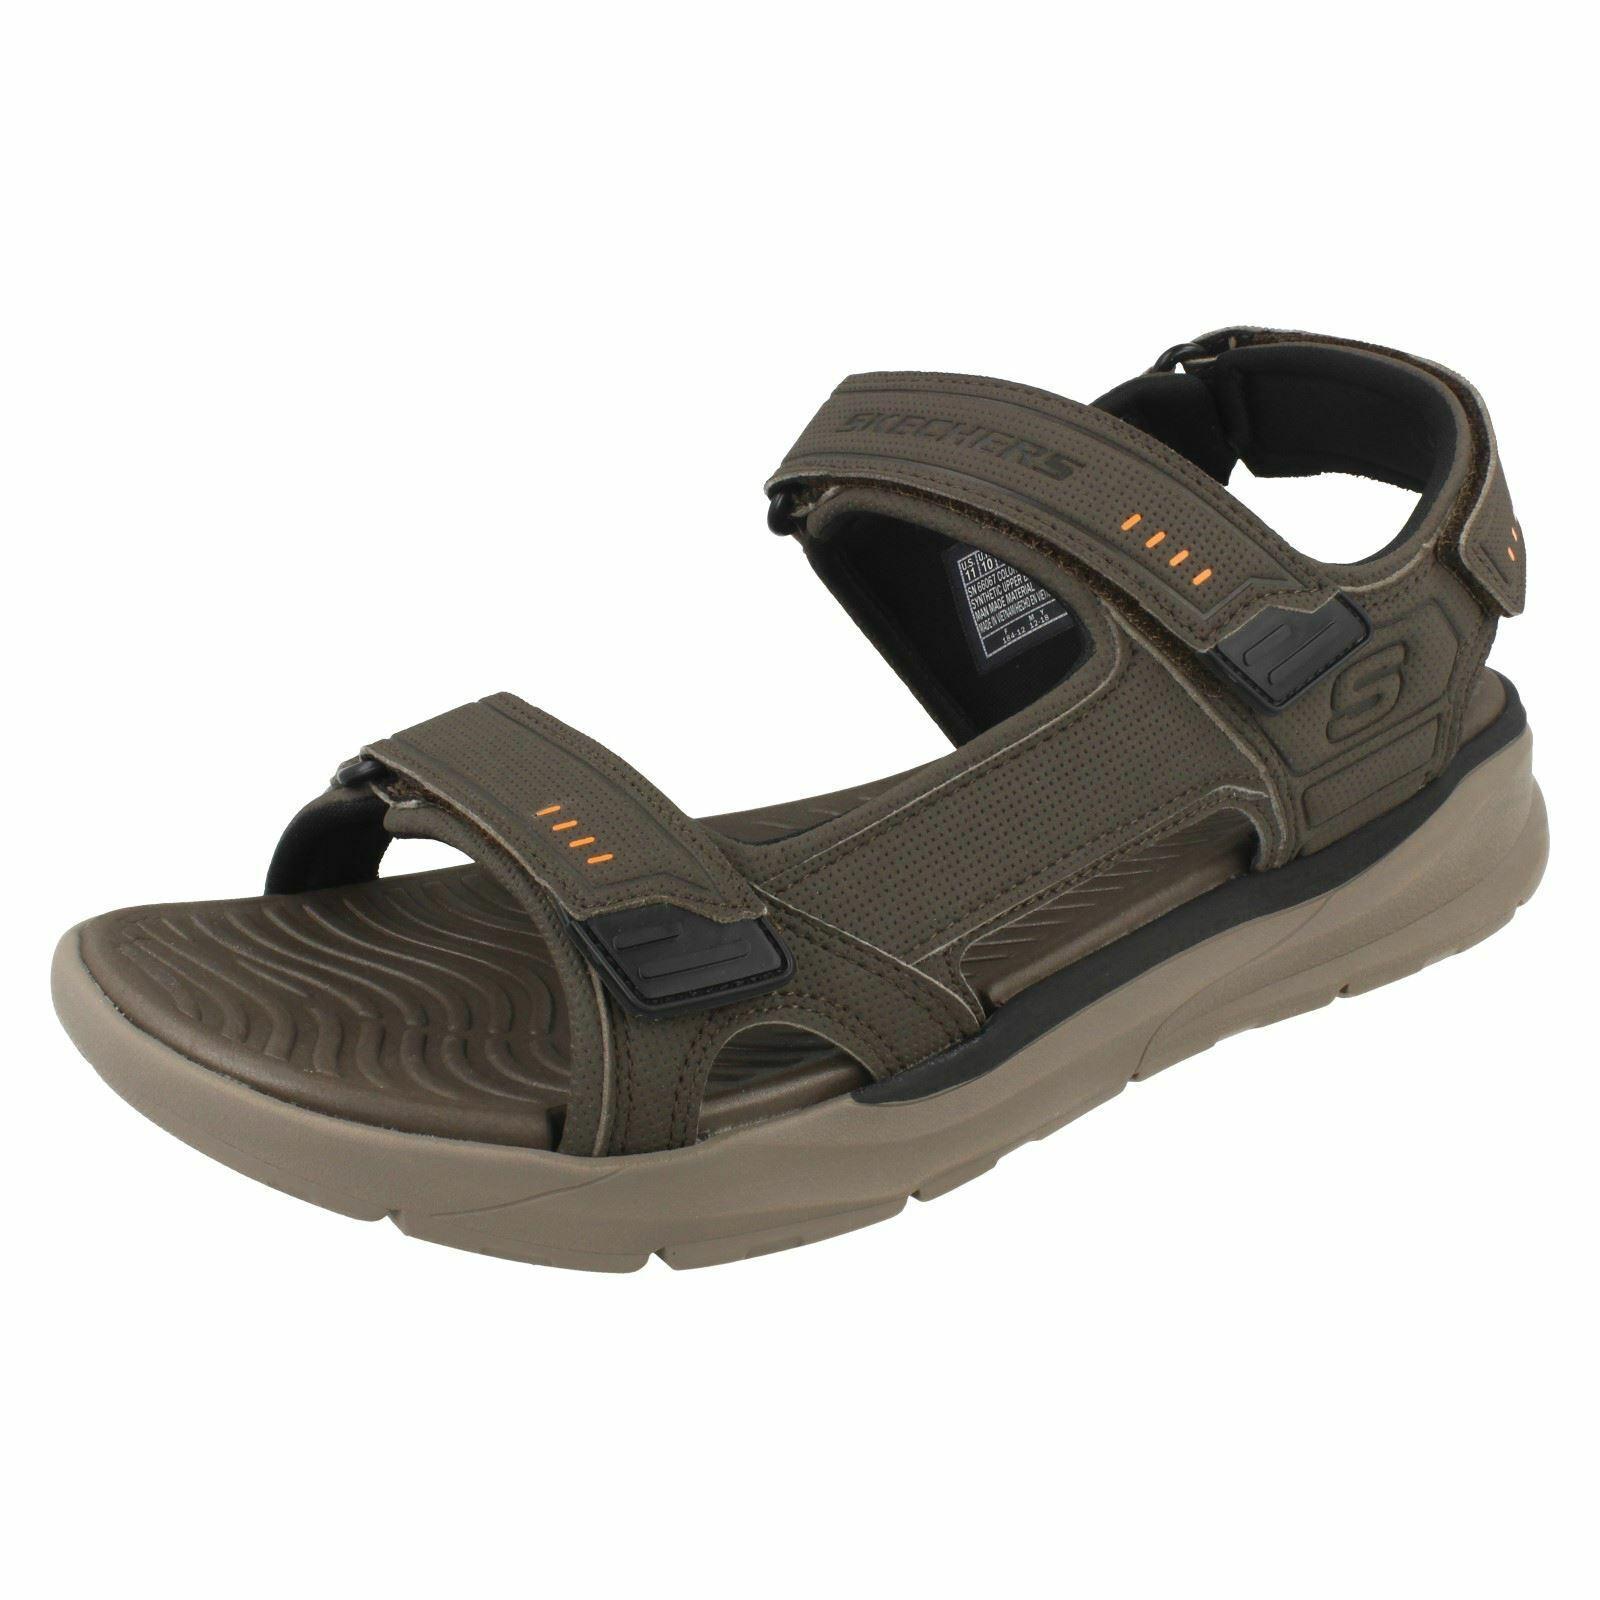 Mens Skechers Casual Memory Foam Relaxed Fit Sandals 'Senco'